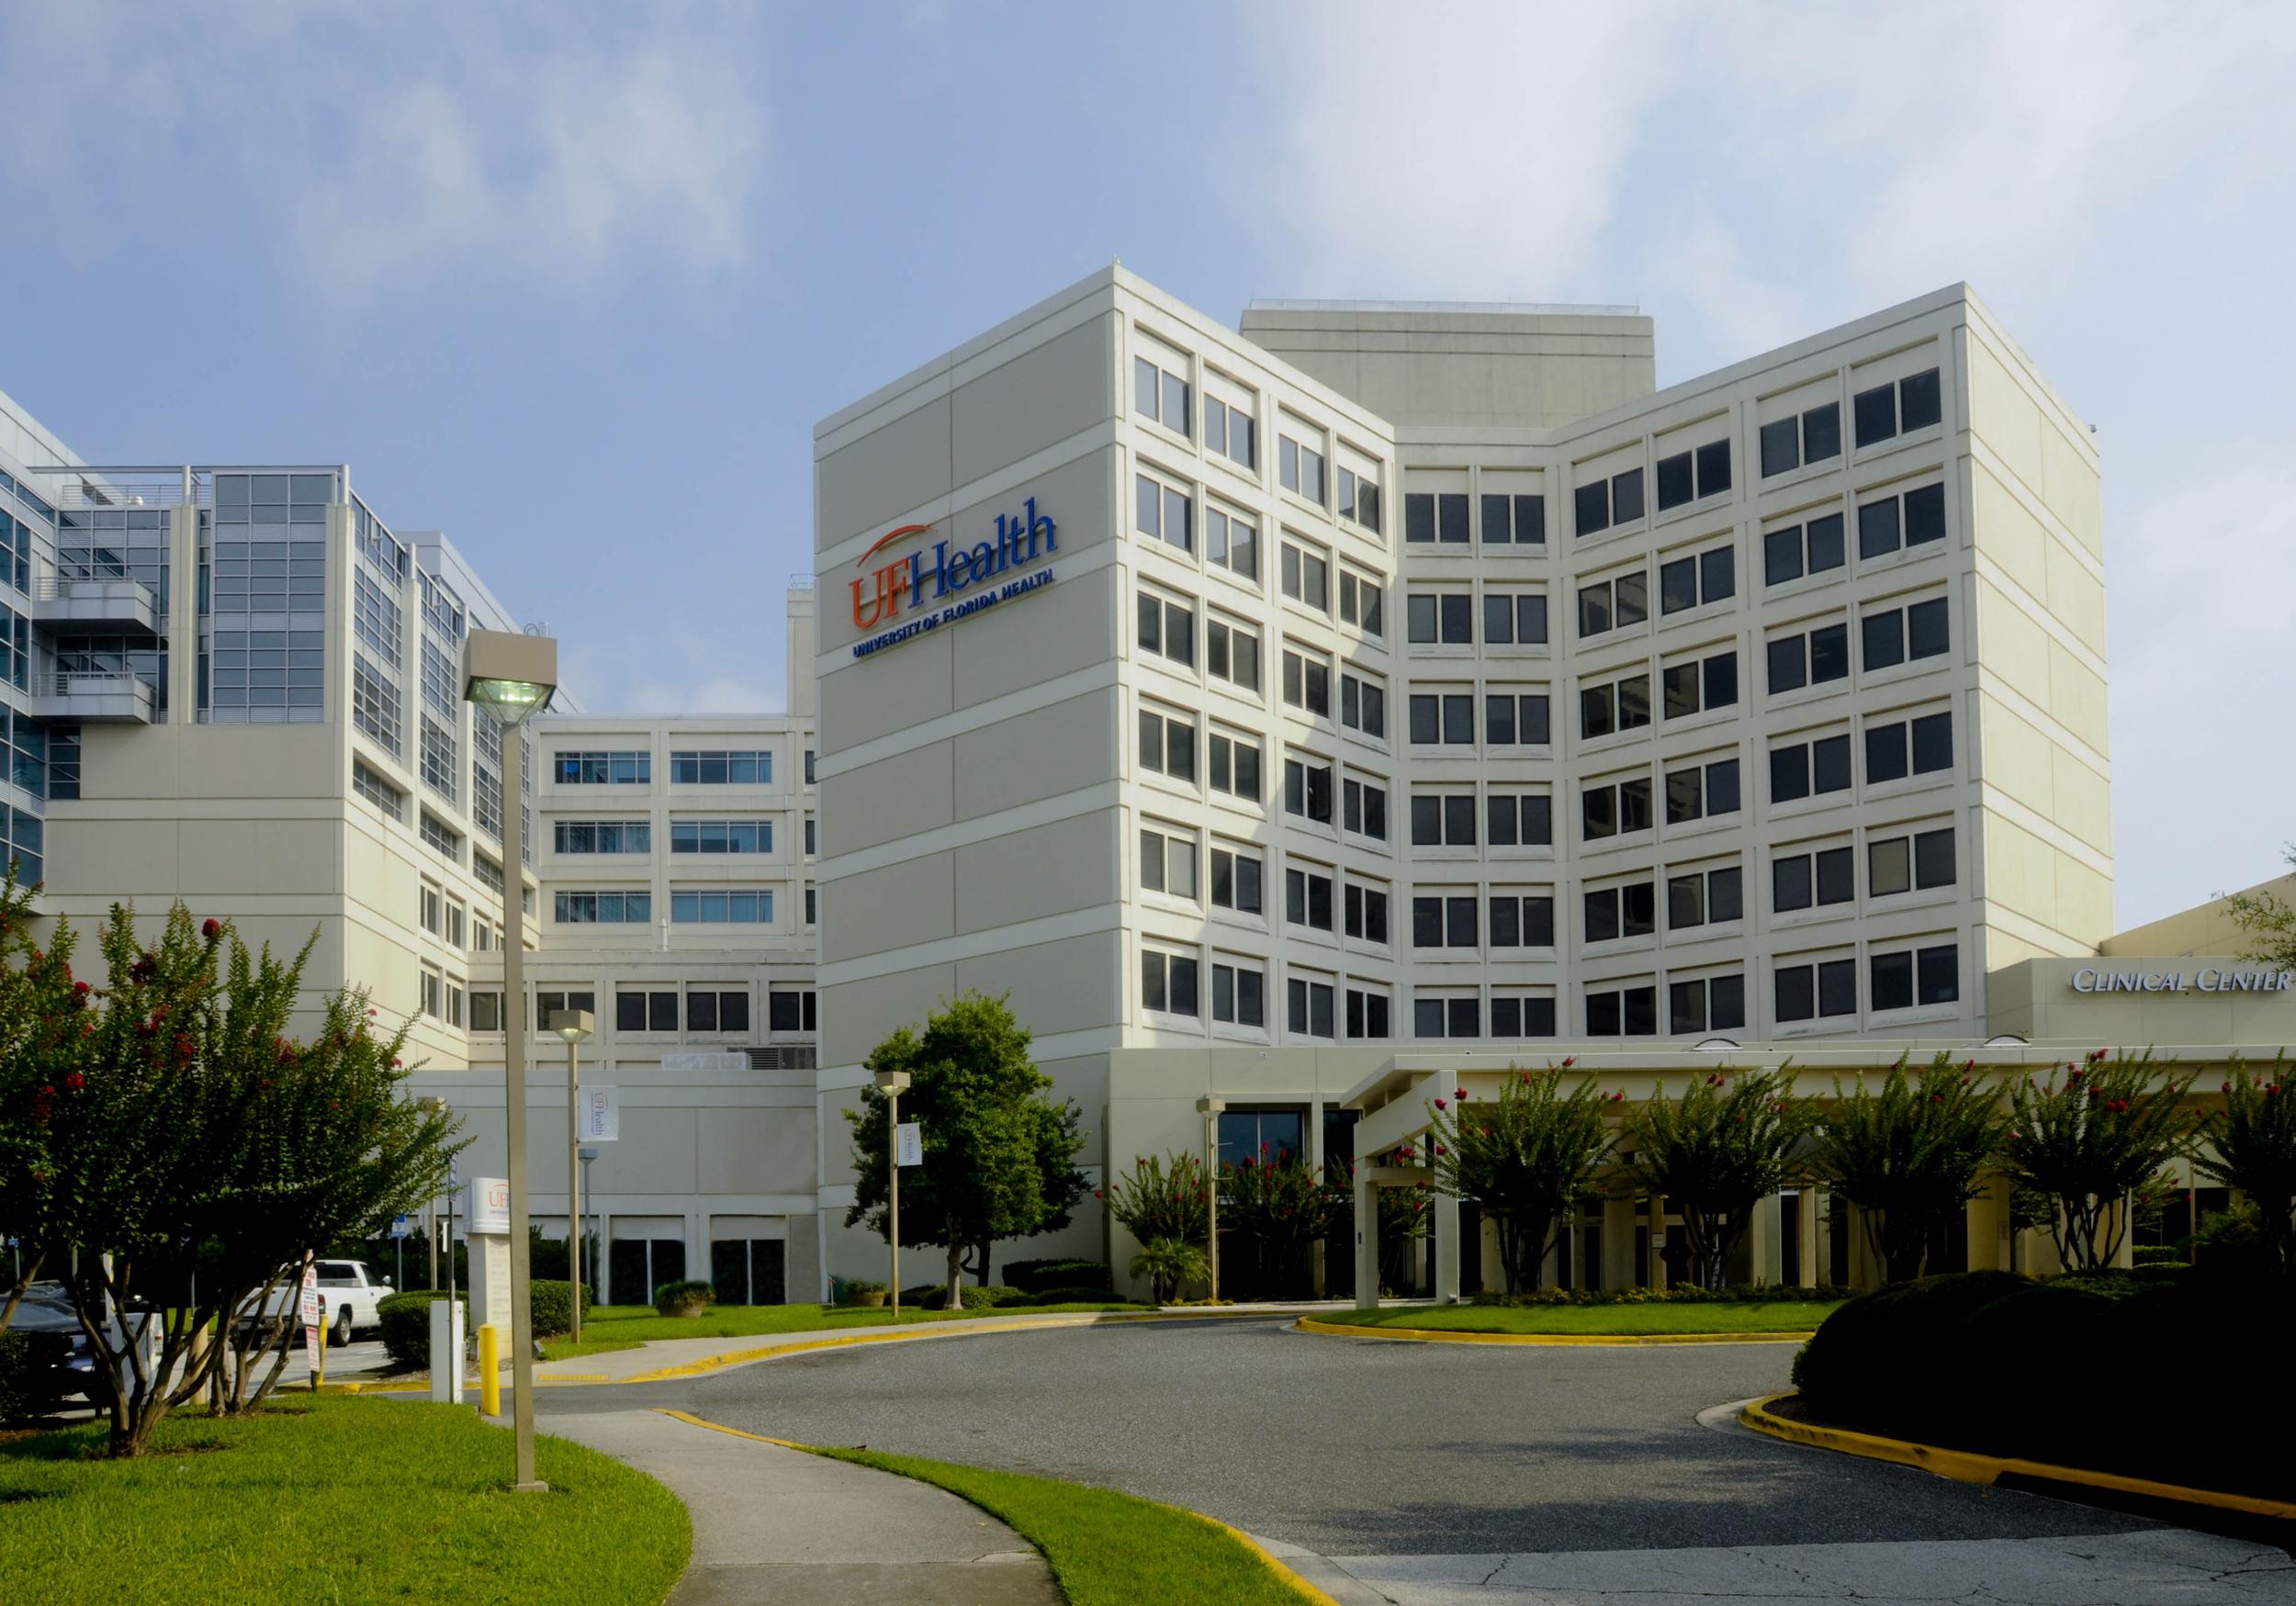 UF_Health_Jacksonville_Exterior_Front.jpg